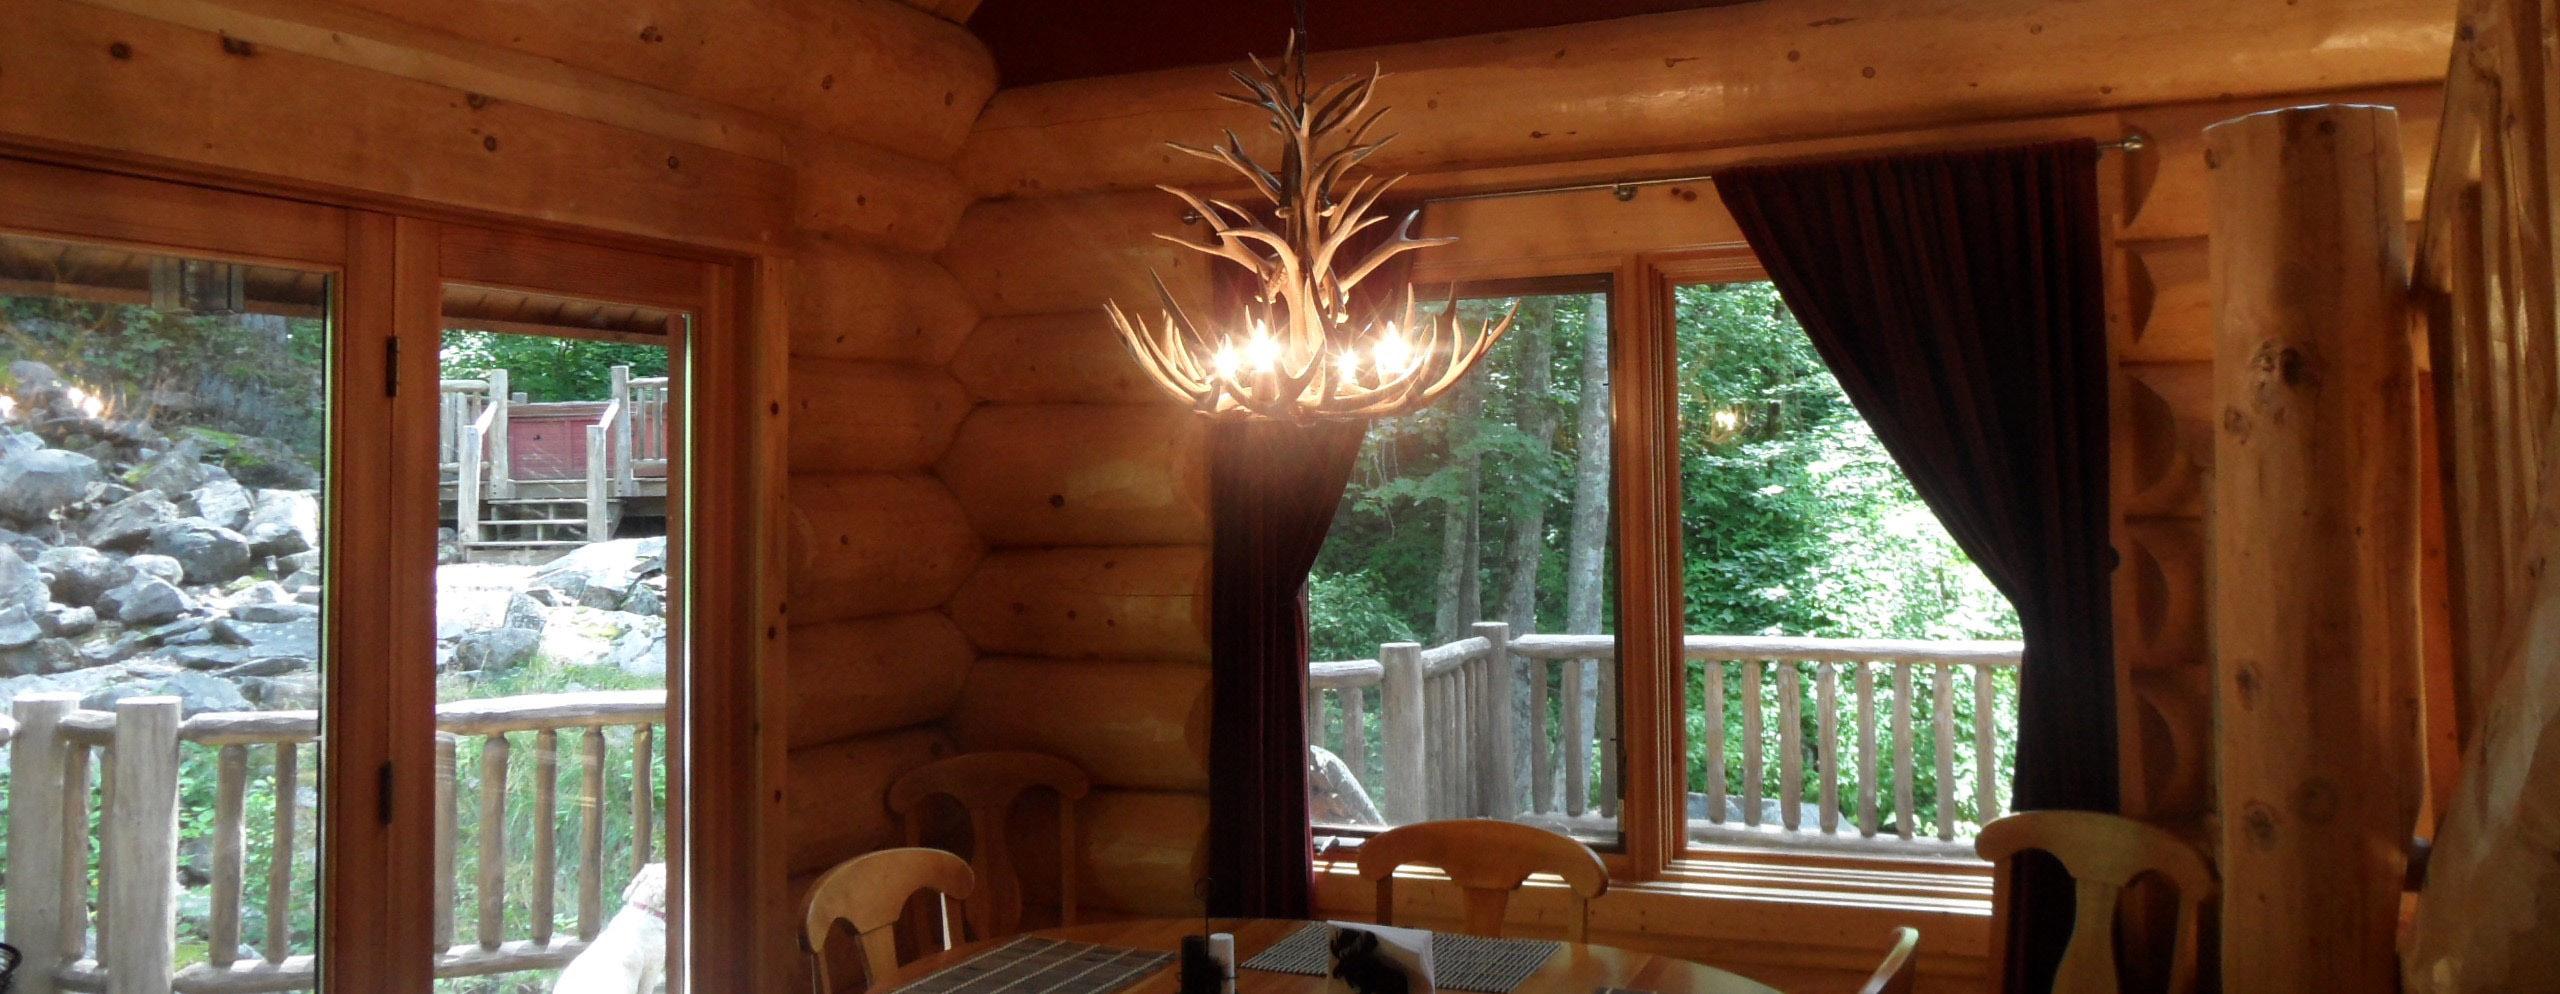 Antler Chandelier Lighting in Log Cabin